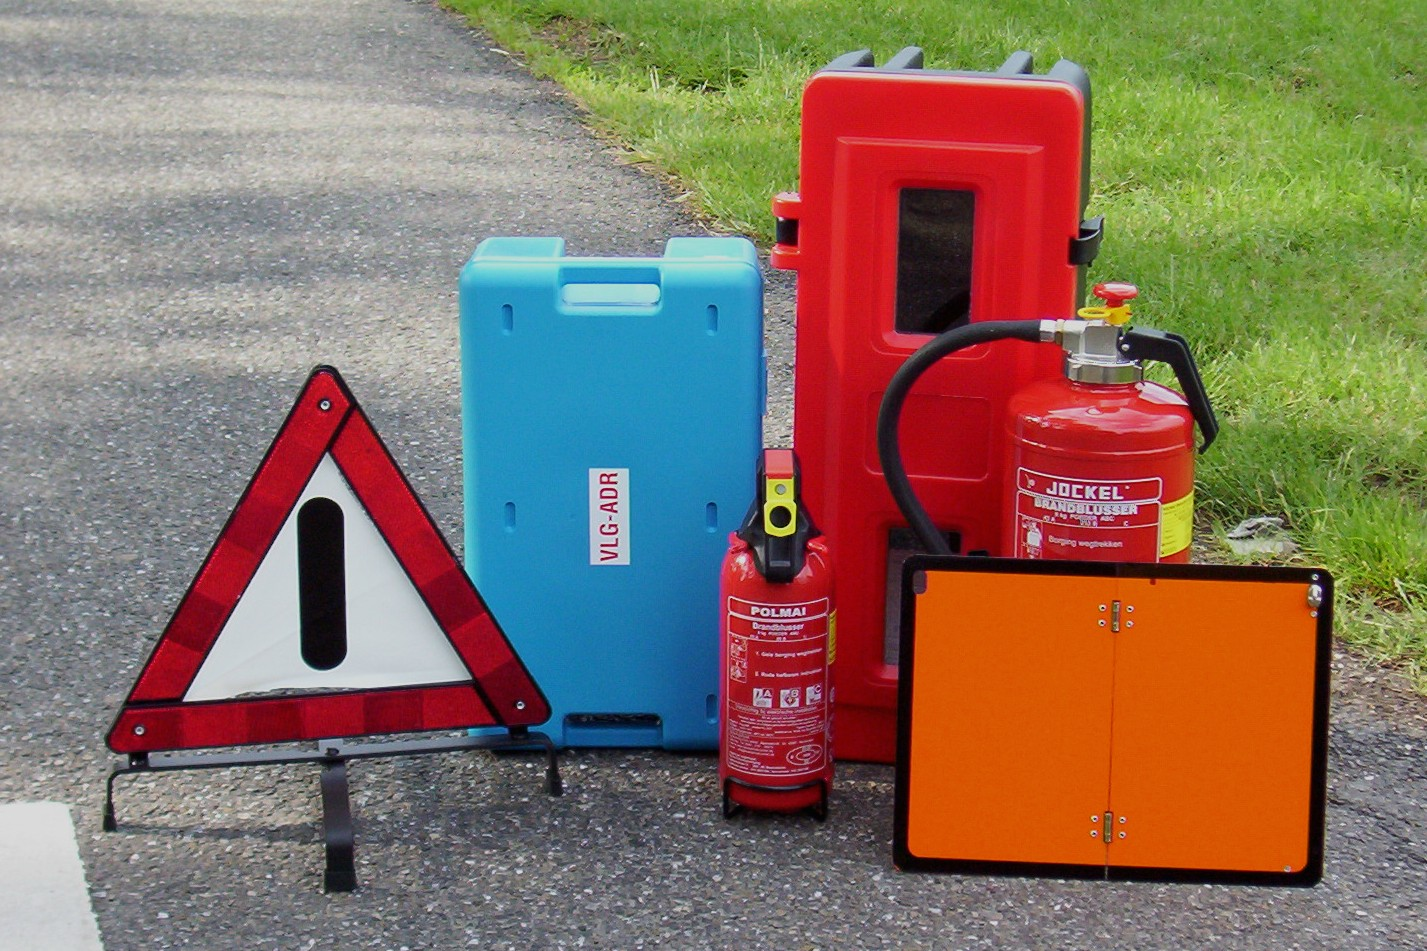 veiligheidsadviseur wegvervoer, nascholing chauffeur, verplichte nascholing, CCV, richtlijn vakbekwaamheid, code 95